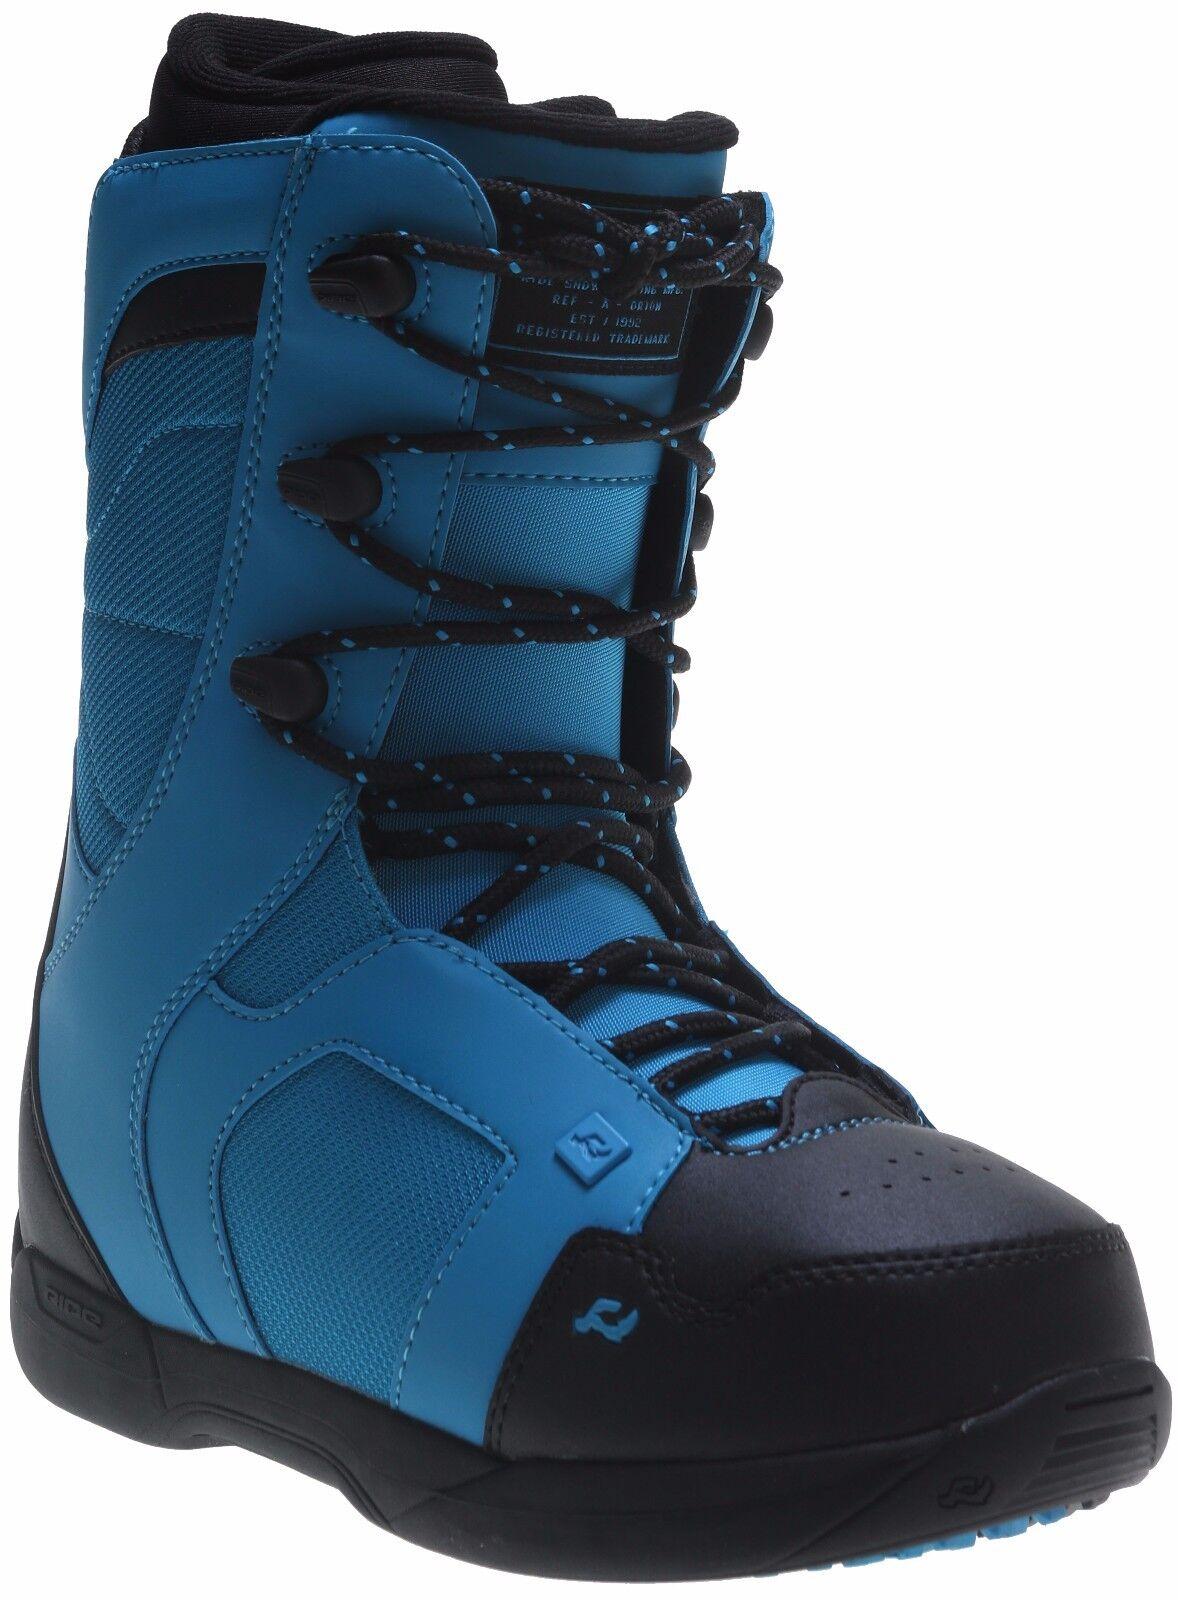 2016 NIB MENS RIDE ORION  SNOWBOARD BOOTS  210 9 bluee intuition foam liner  designer online